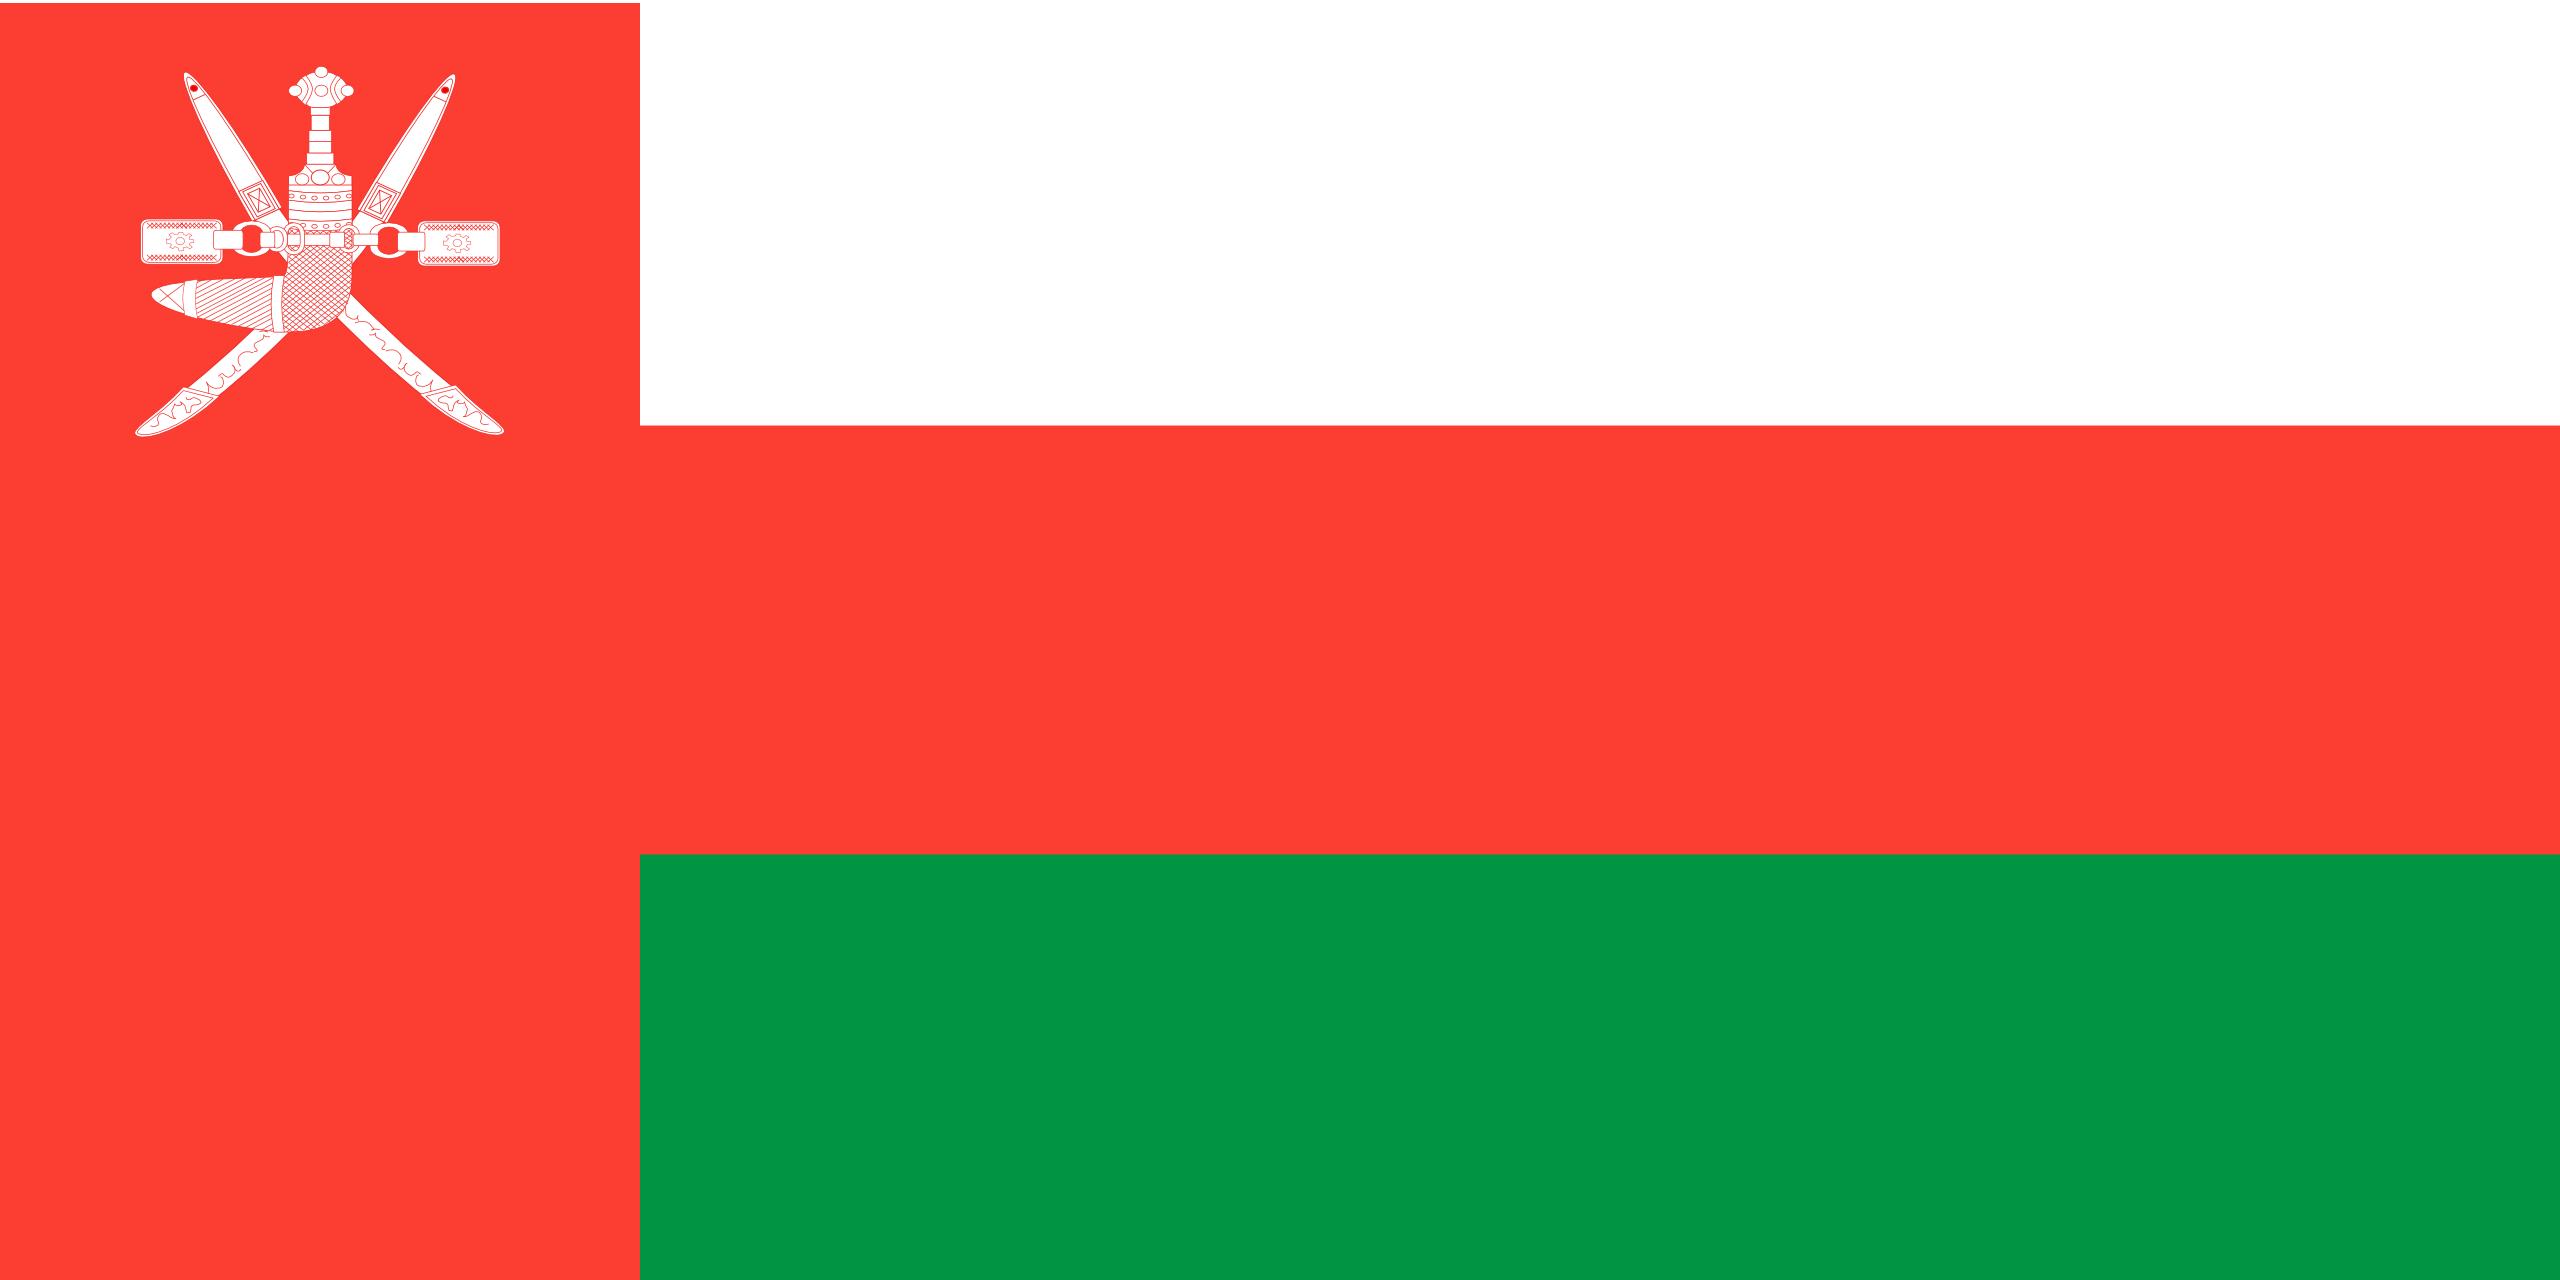 omán, paese, emblema, logo, simbolo - Sfondi HD - Professor-falken.com